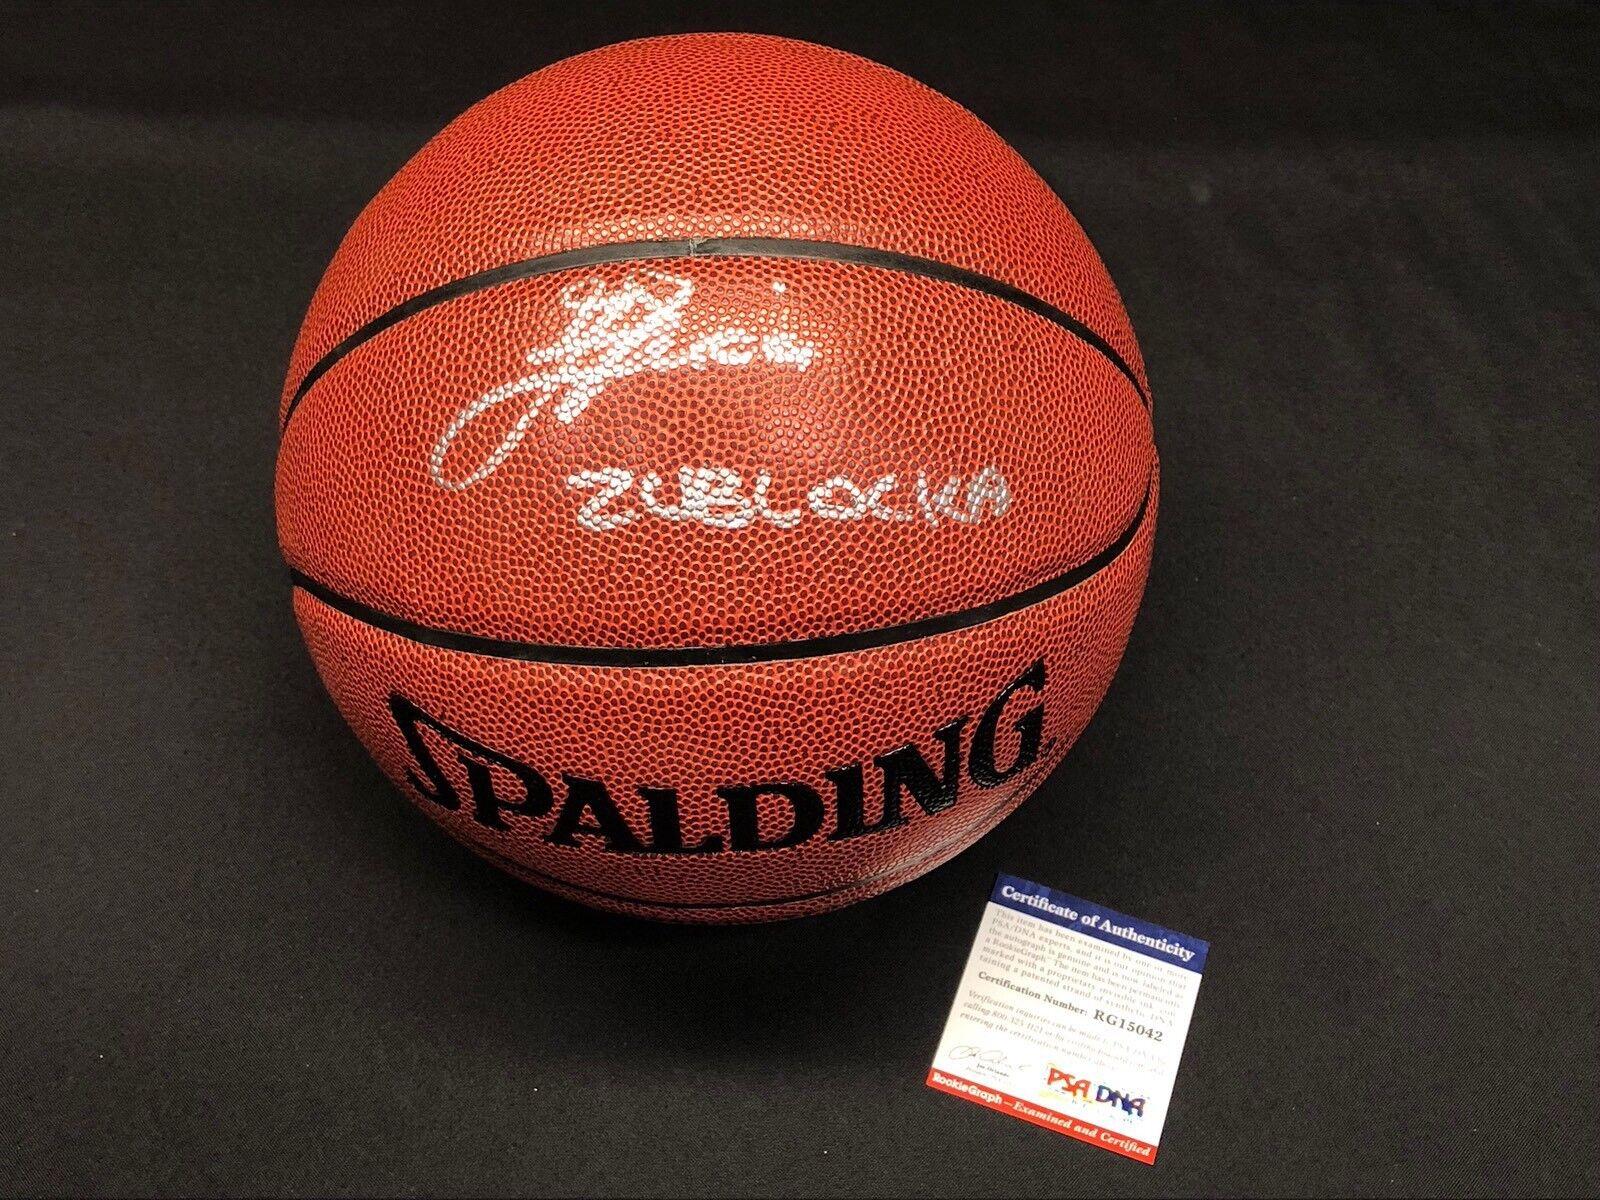 Ivica Zubac Signed Spalding NBA I/O Basketball